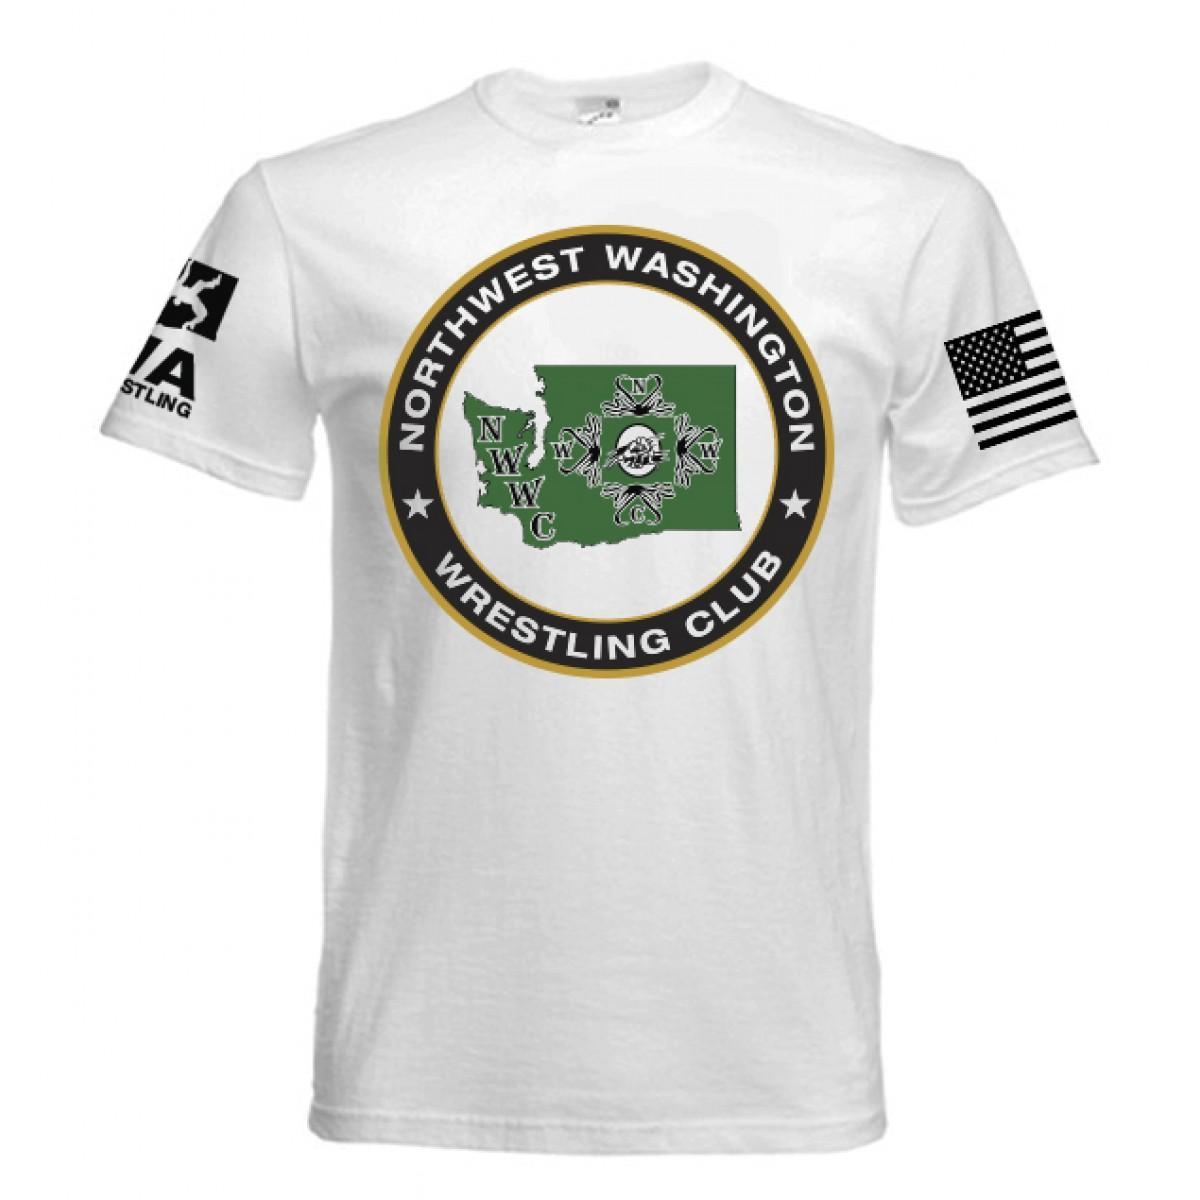 NWWC White T-shirt Green Logo-White-YM